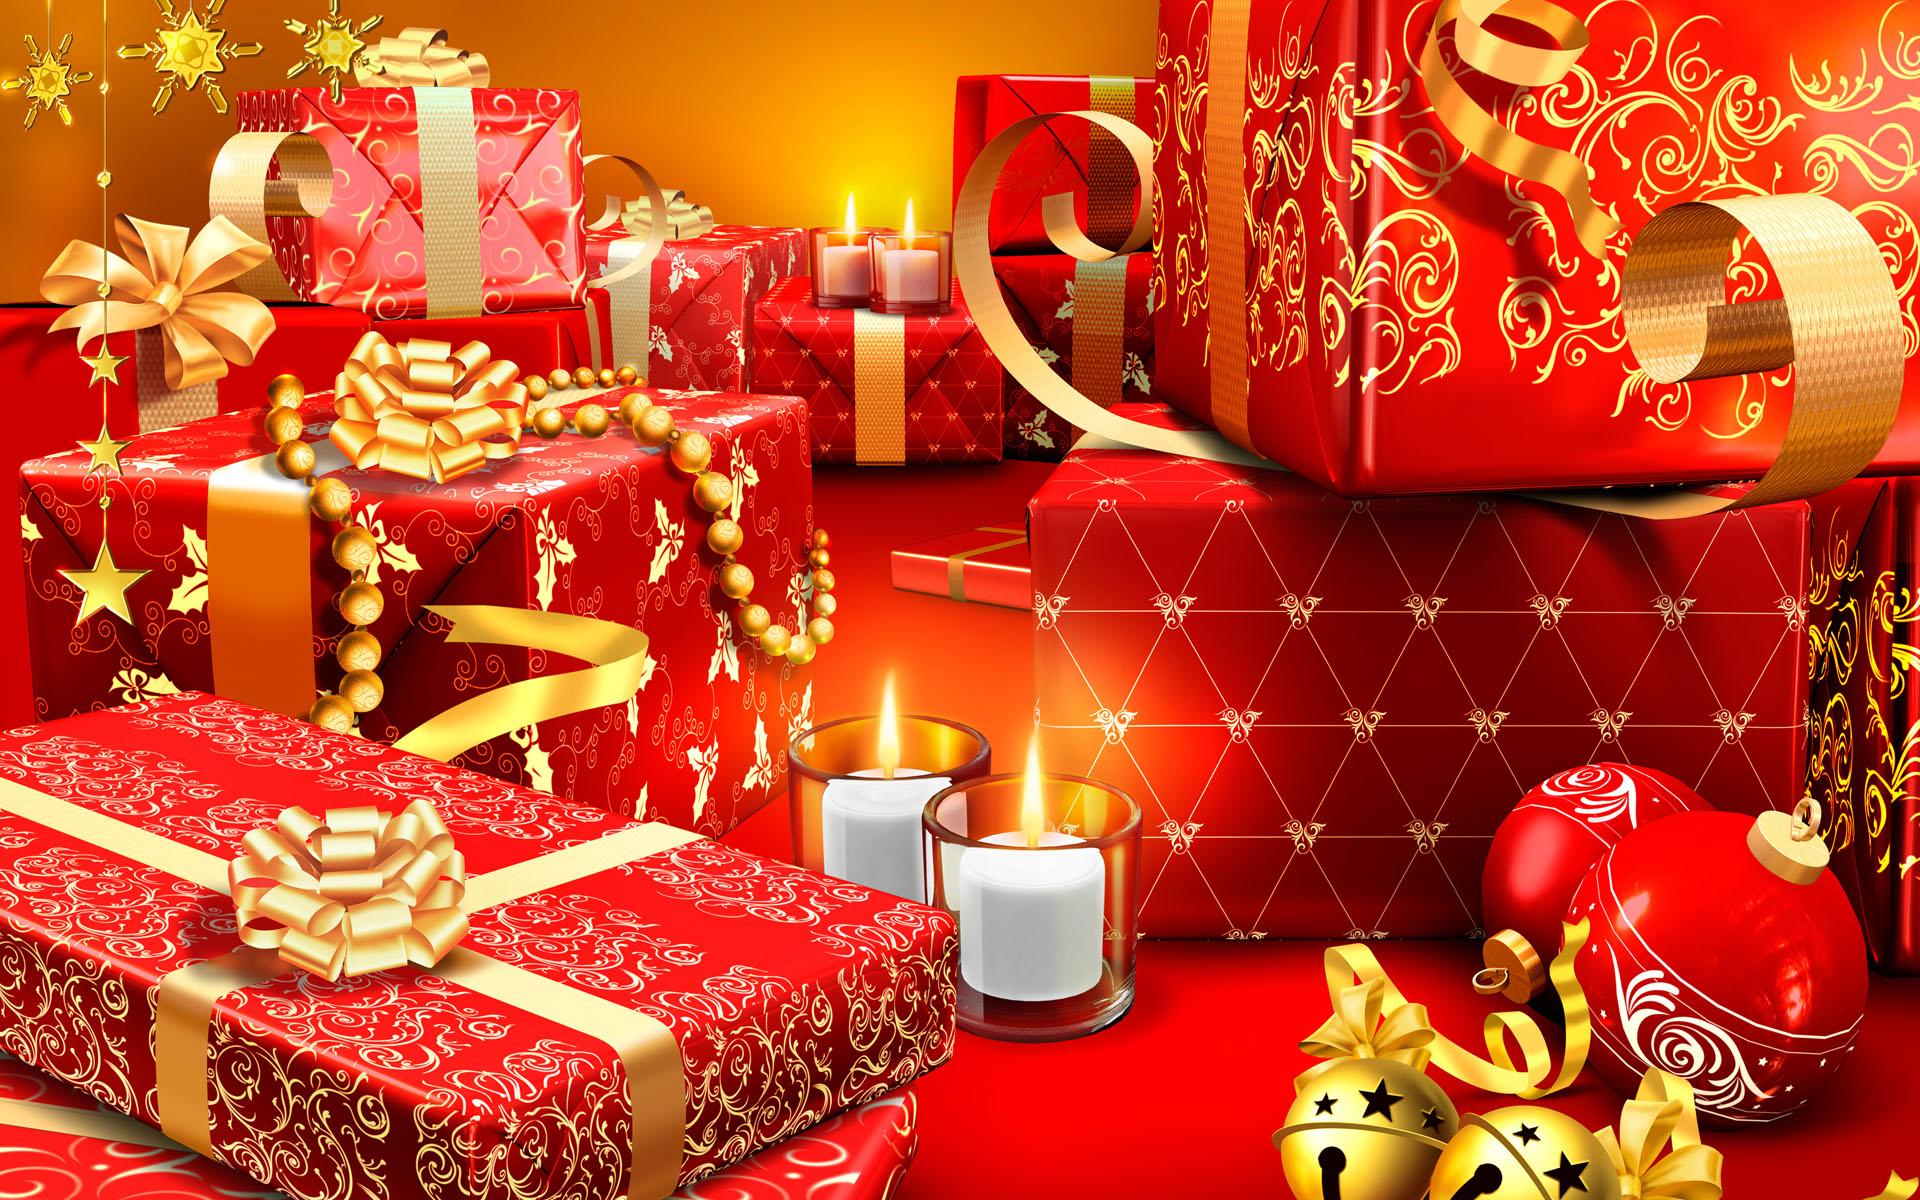 ... christmas presents when christmas is around the corner children will